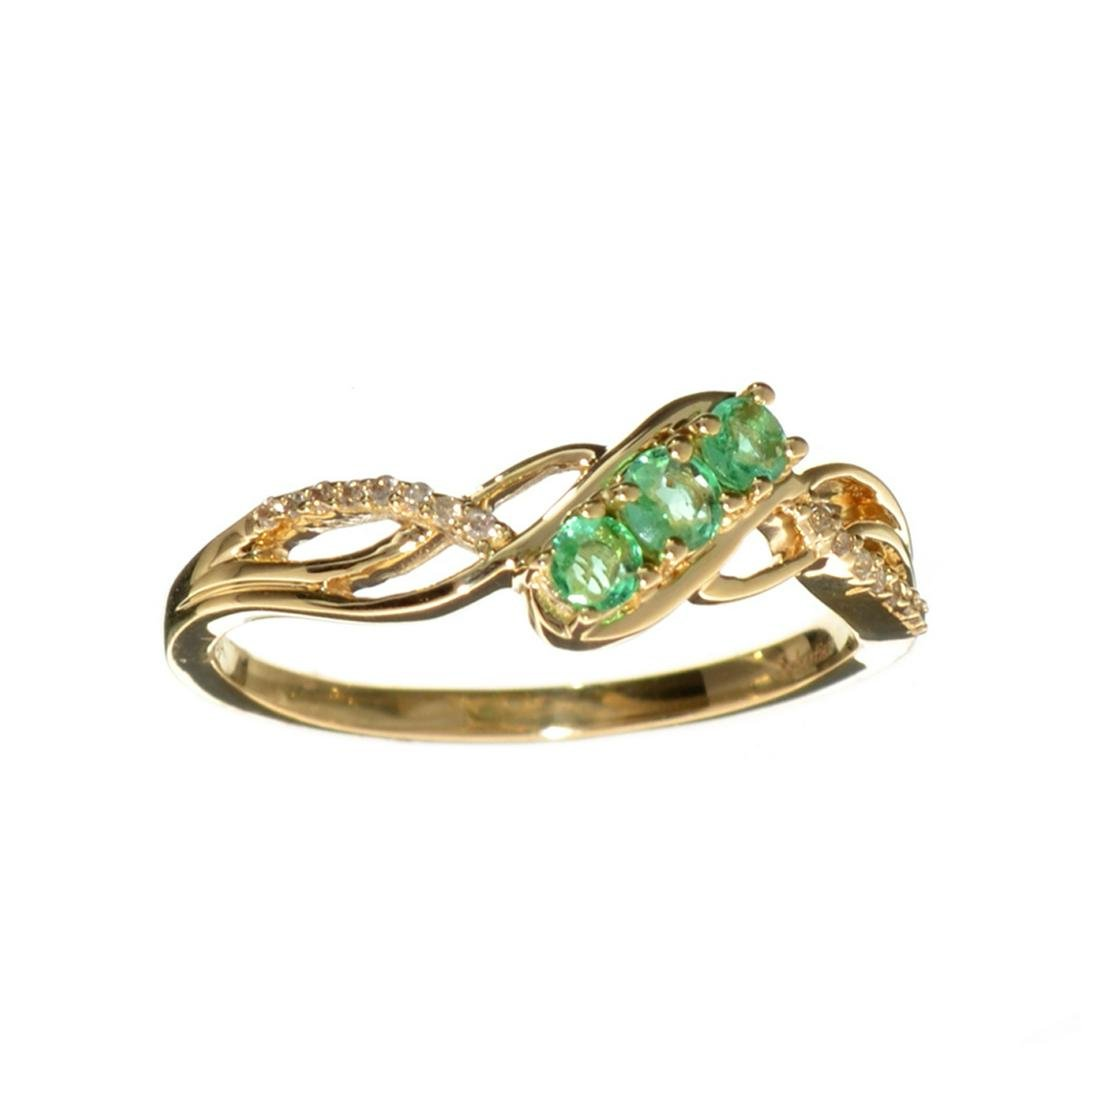 Designer Sebastian 14 KT Gold 0.35CT Emerald and 0.04CT